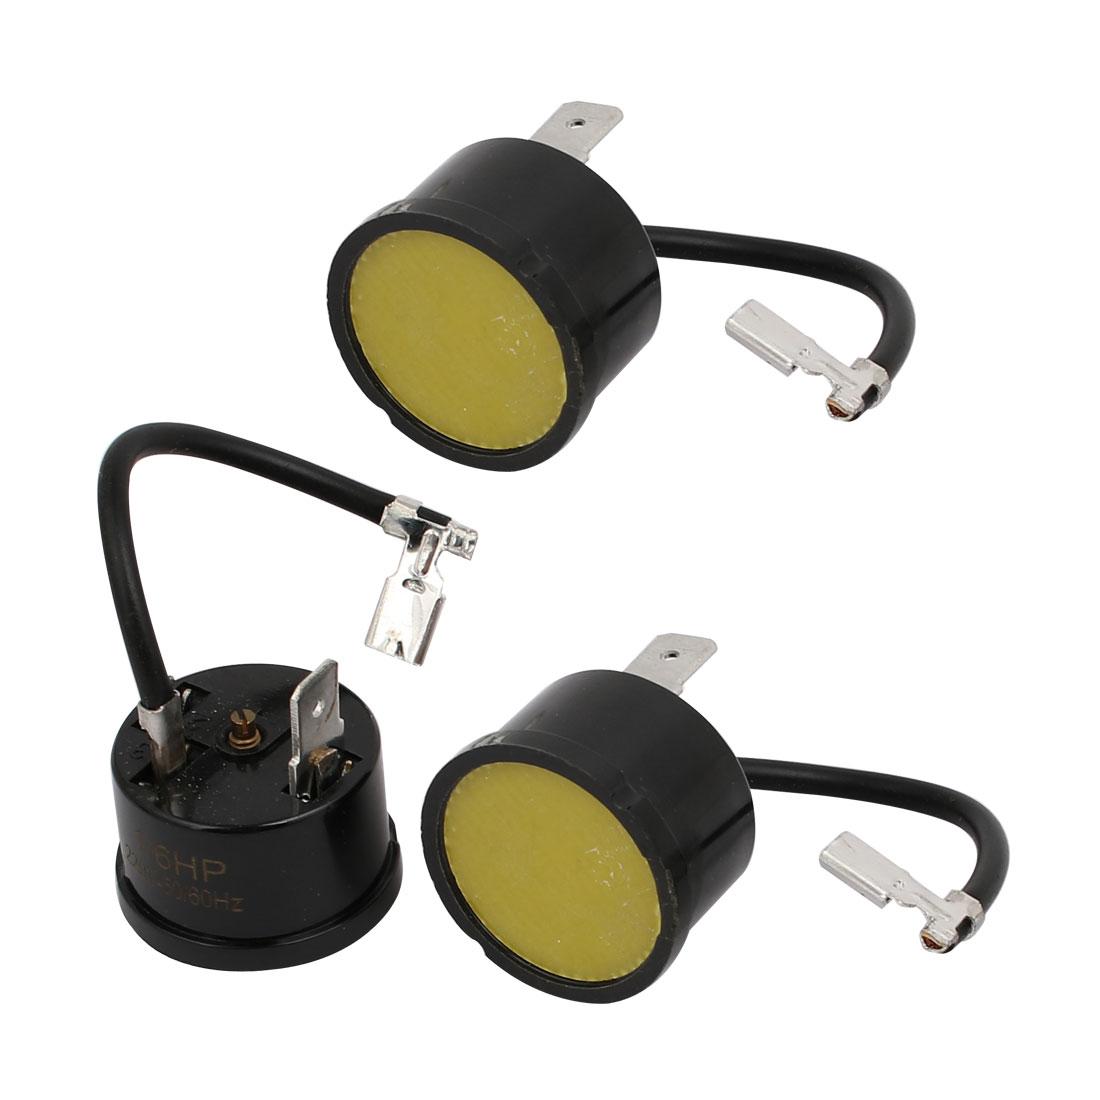 3 Pcs Overload Thermal Protector Relay Starter for 1/6 HP Fridge AC220~240V - image 3 de 3